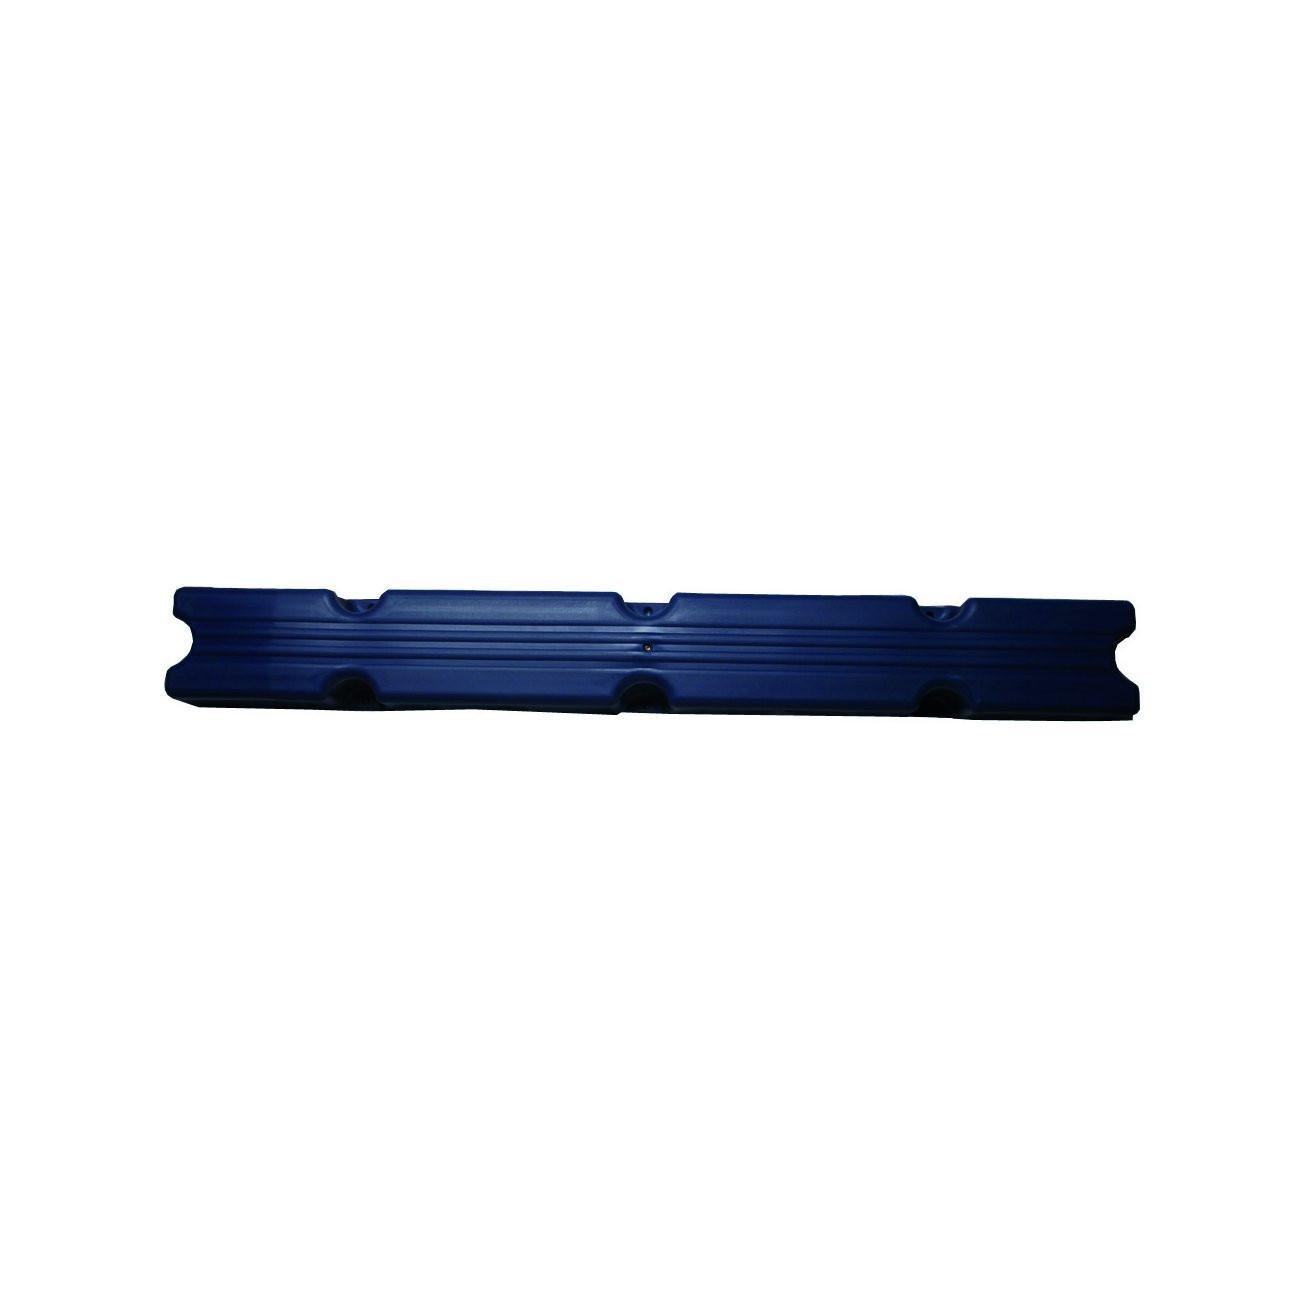 Pontonfender 50x12x7x7cm, marine